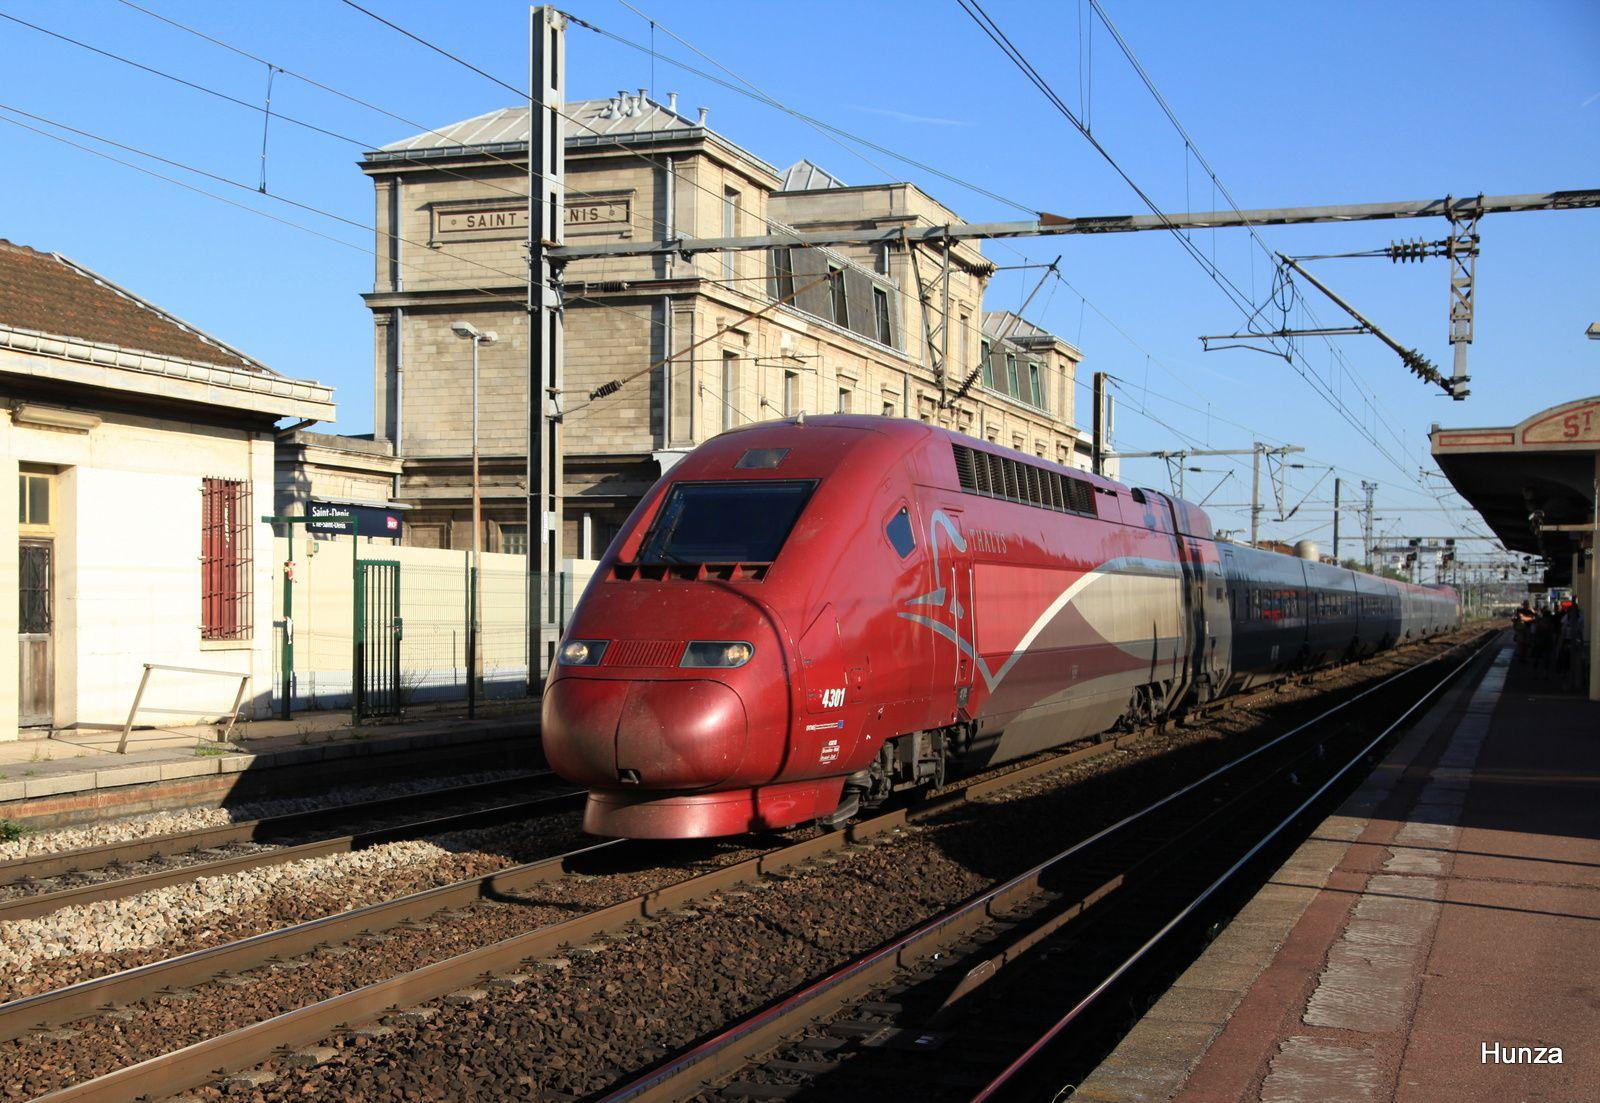 TGV PBKA à Saint-Denis (7 juillet 2015) - rame 4301 de la SNCB